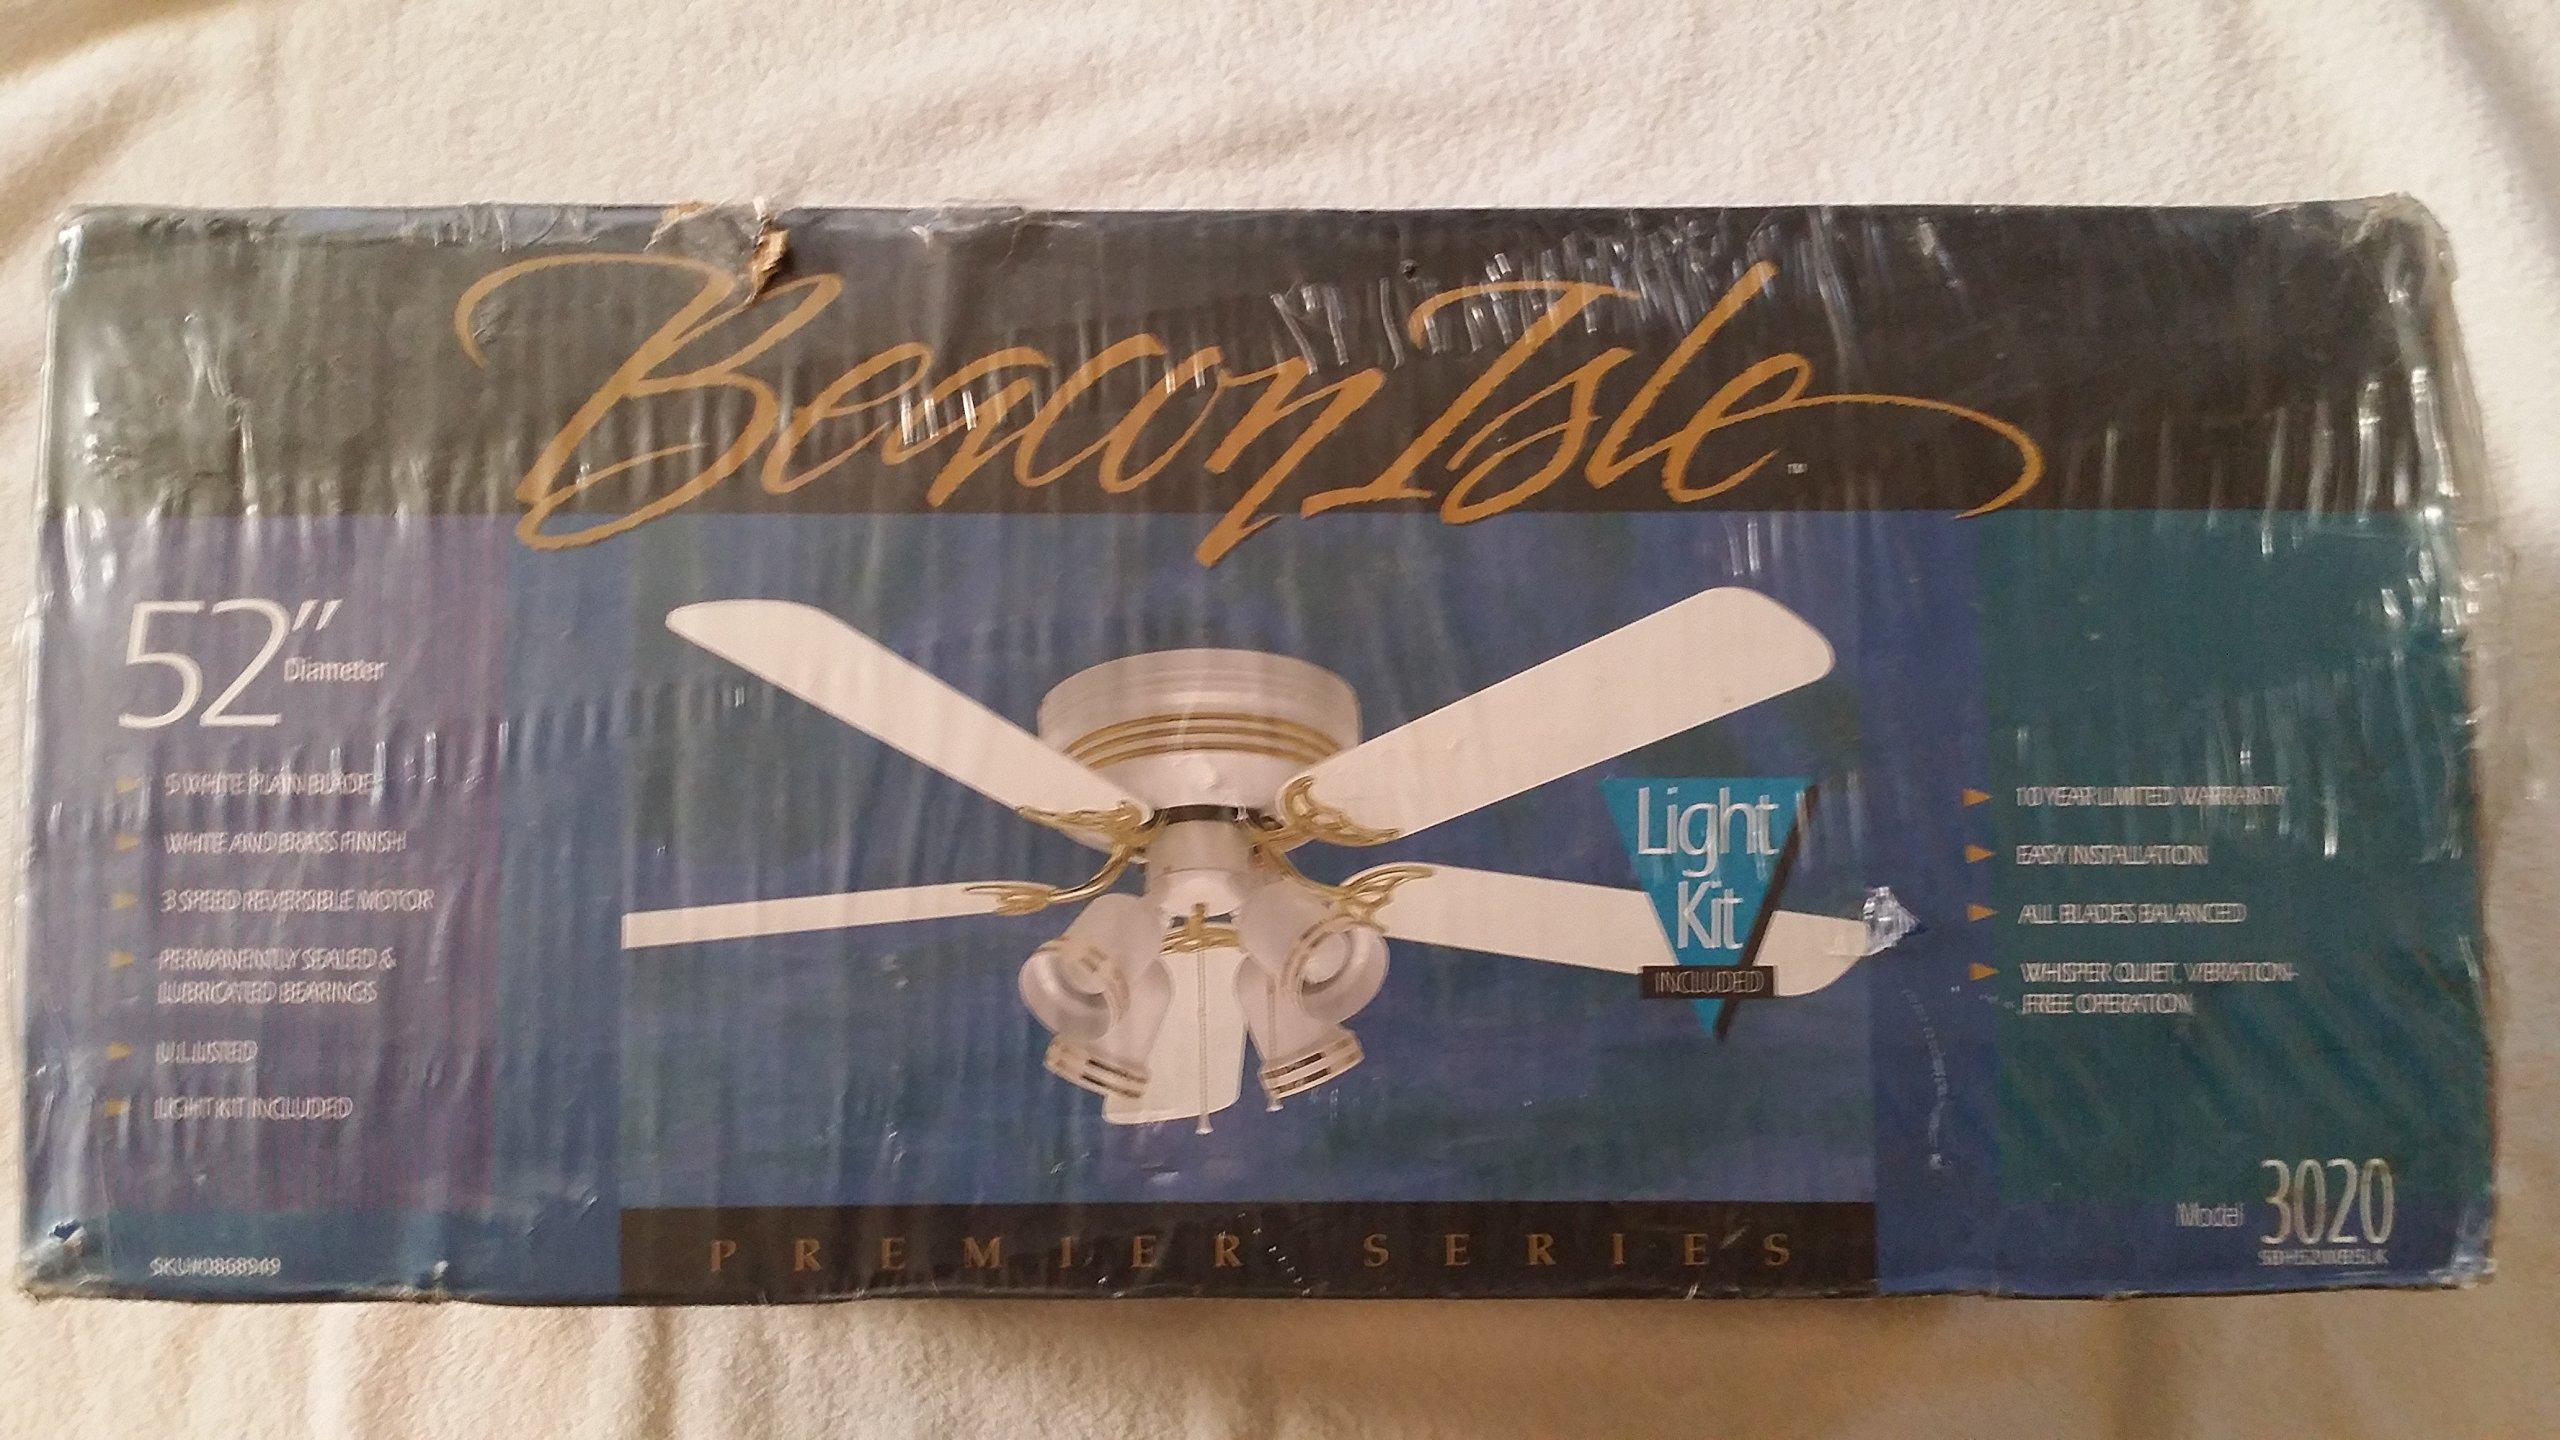 52'' Diameter ''Premier Series'' White Ceiling Fan w/Lighting Kit (Model 3020) by Beacon Isle